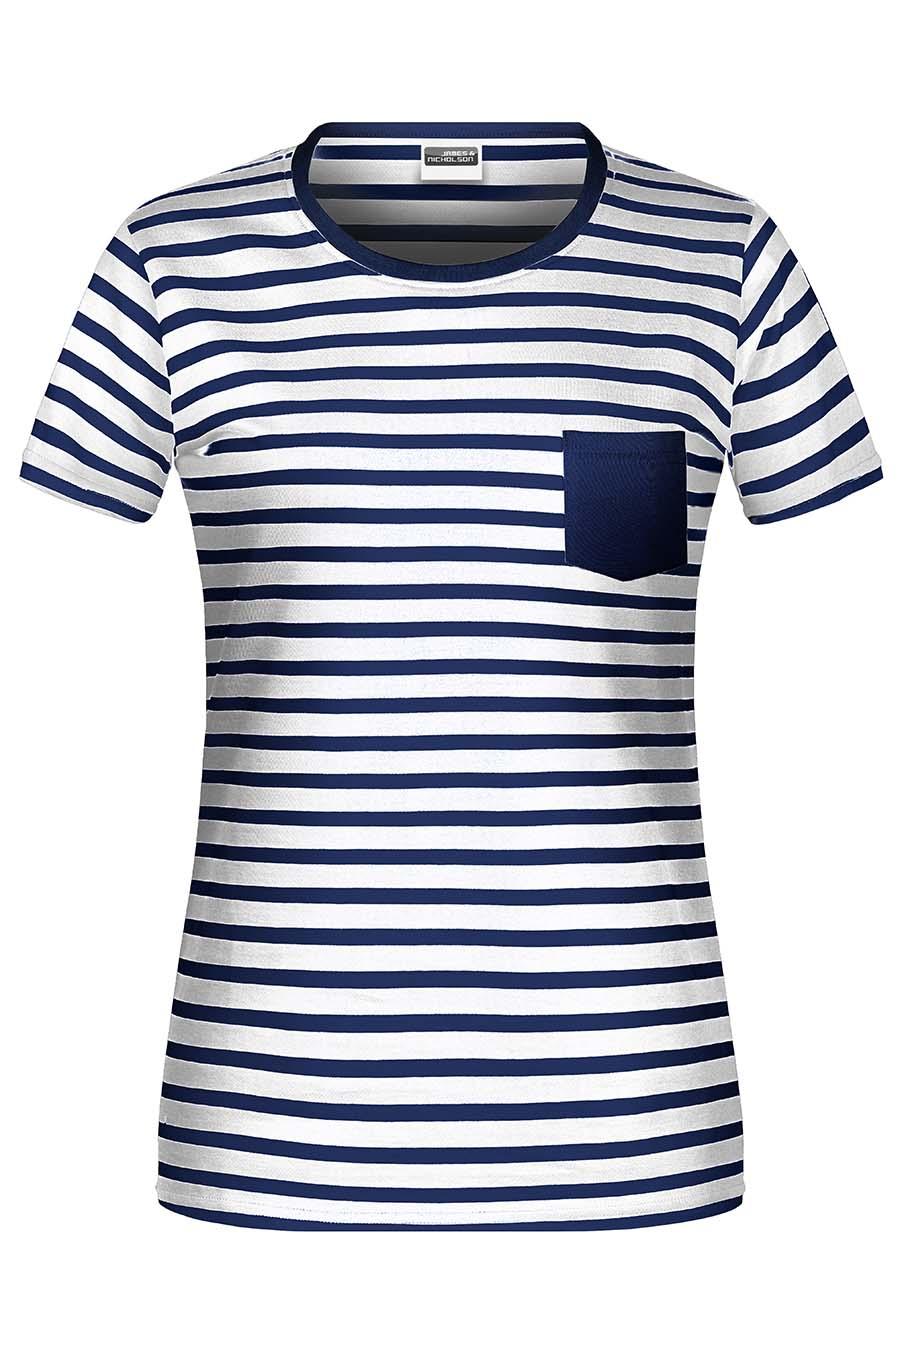 Tee-shirt bio rayé Femme - 20-1490-4